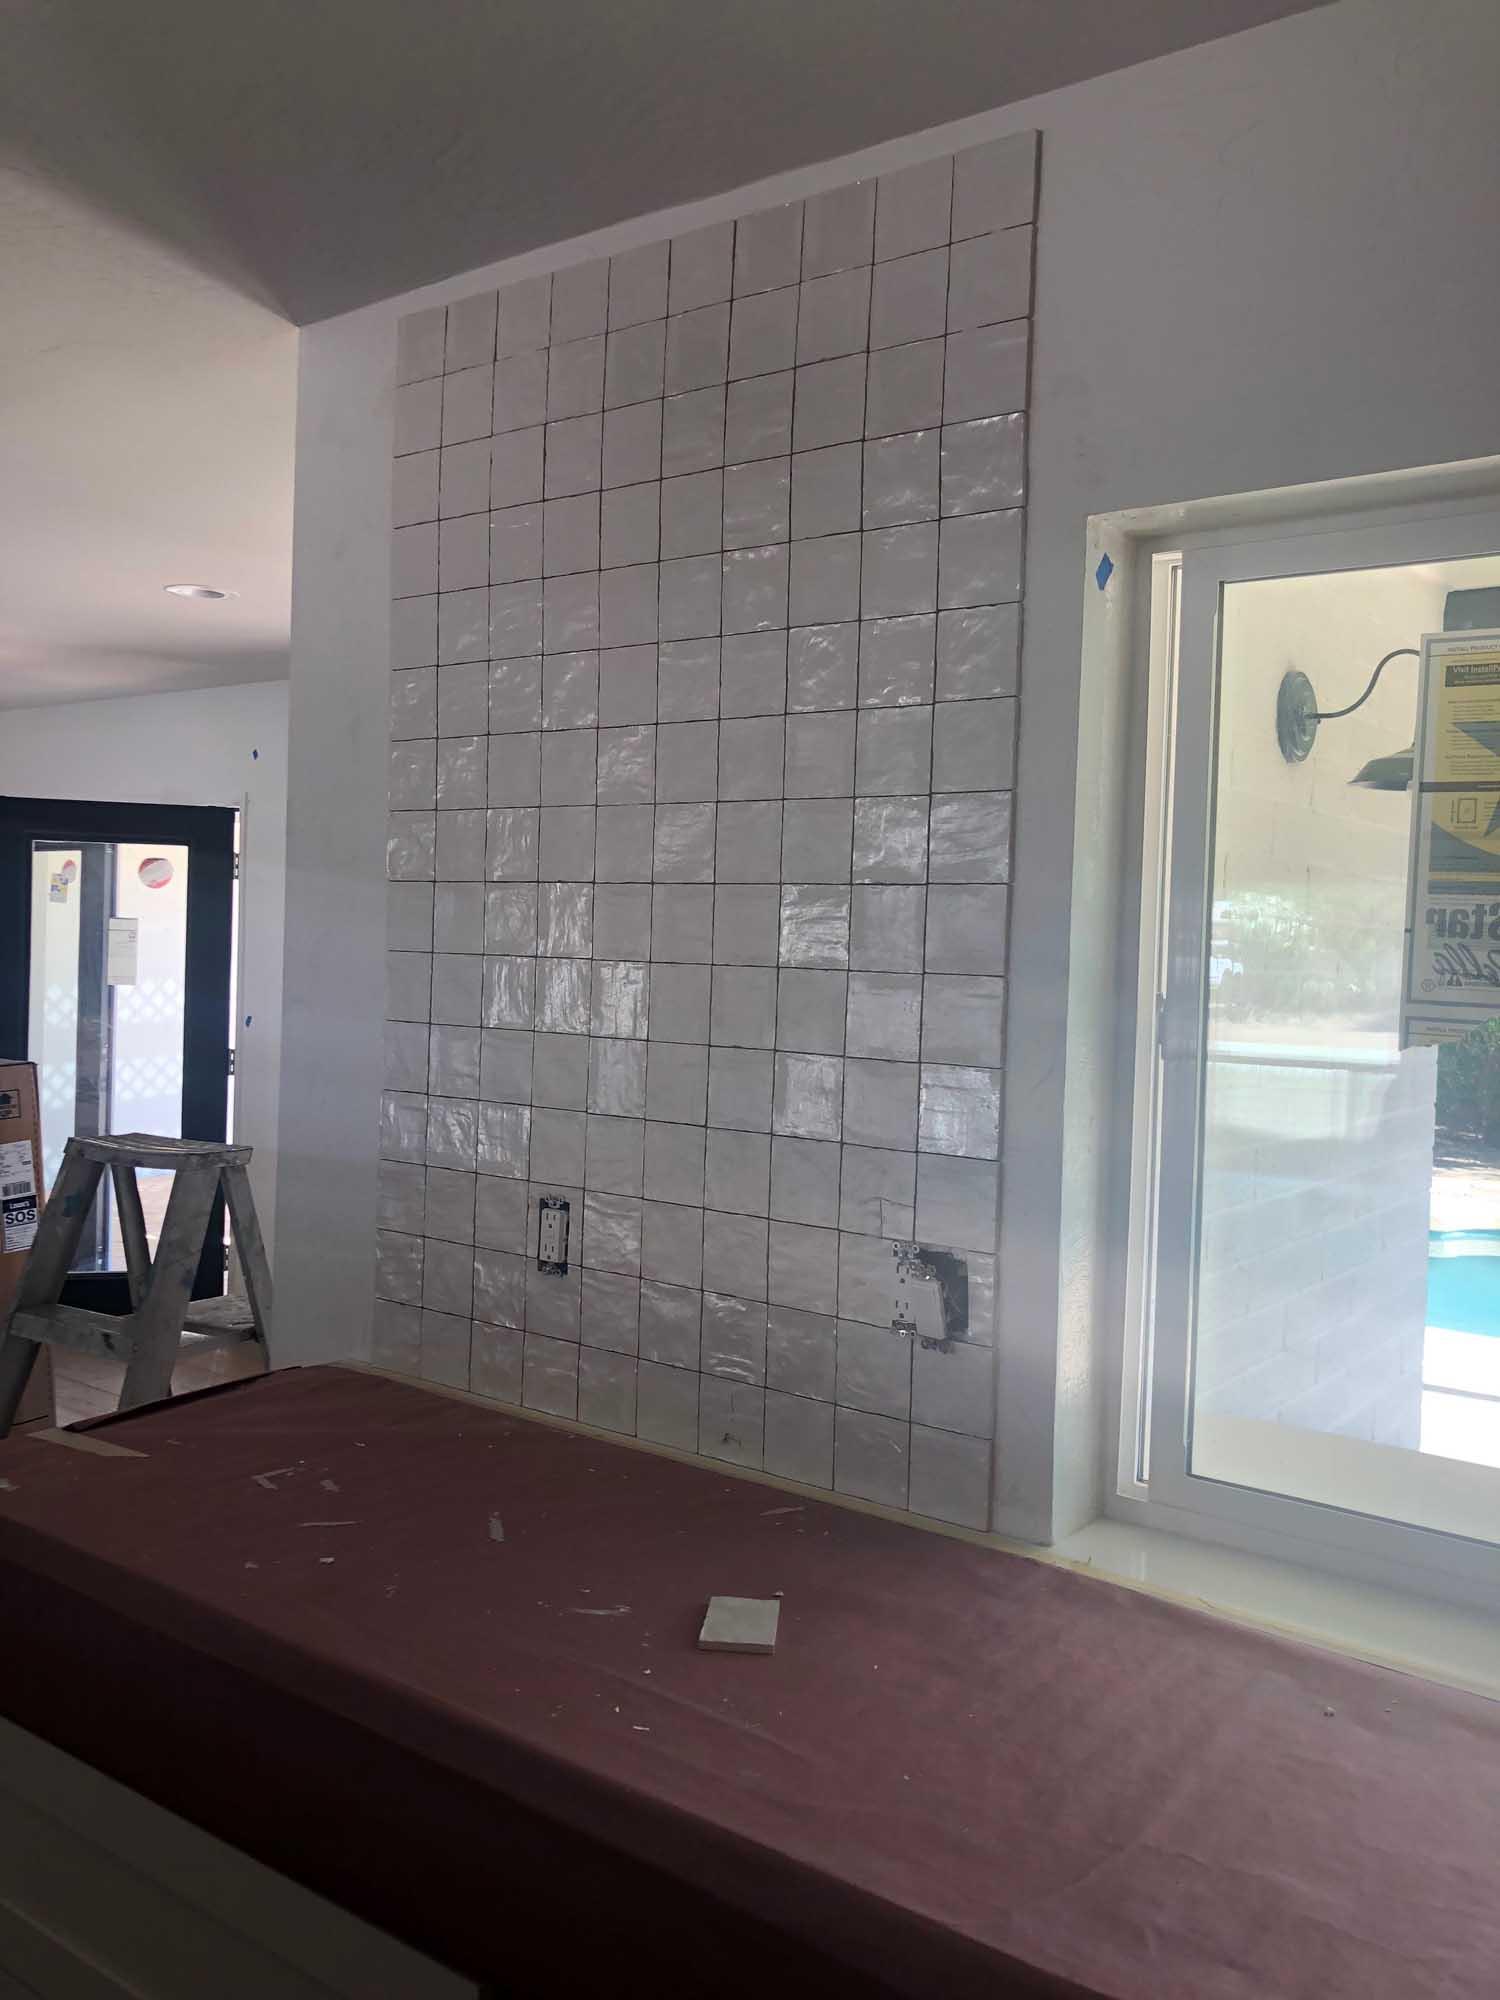 Ongoing wall renovation